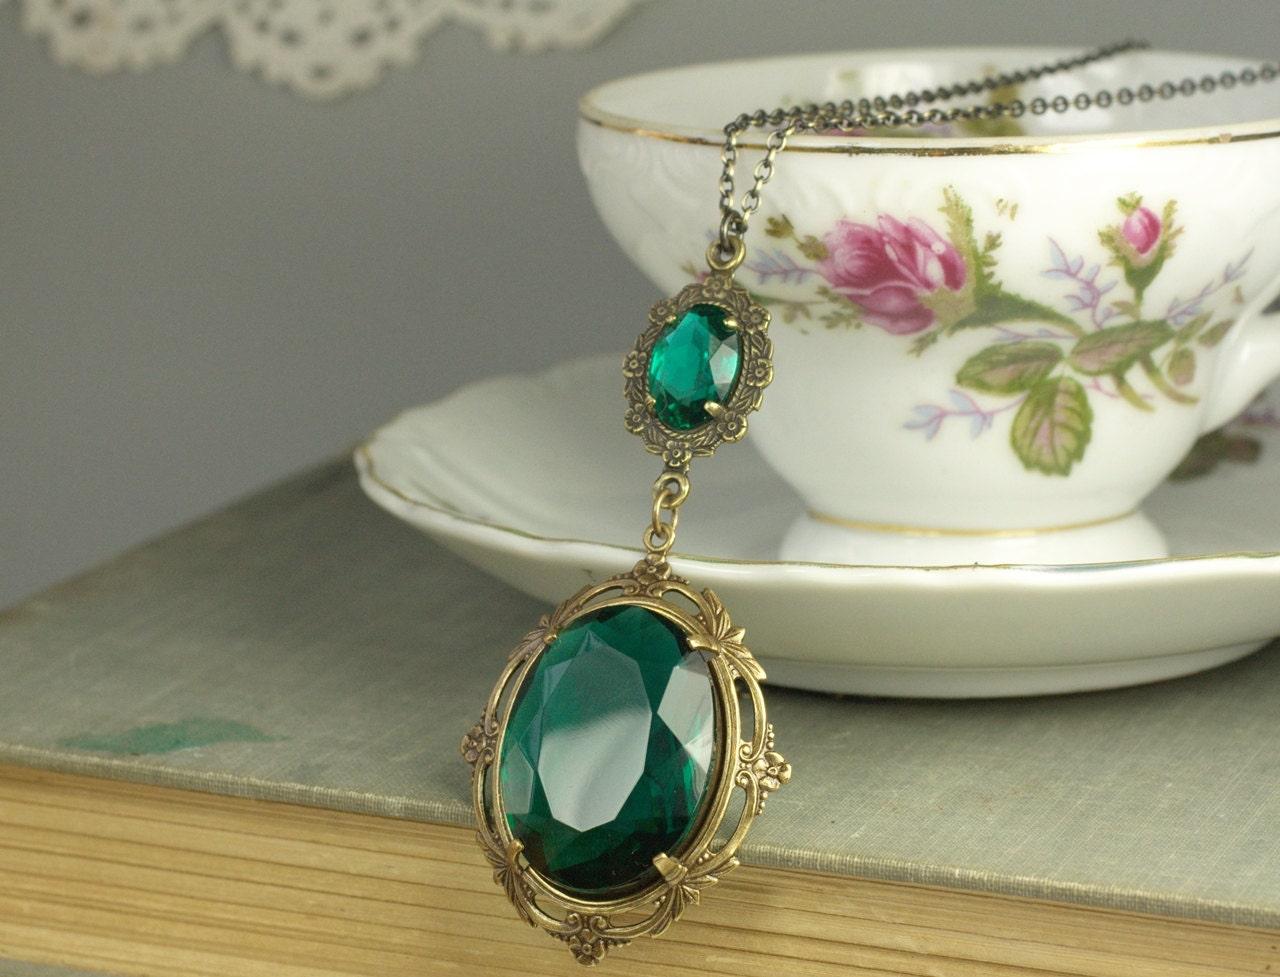 emerald necklace victorian jewel brass antique edwardian art